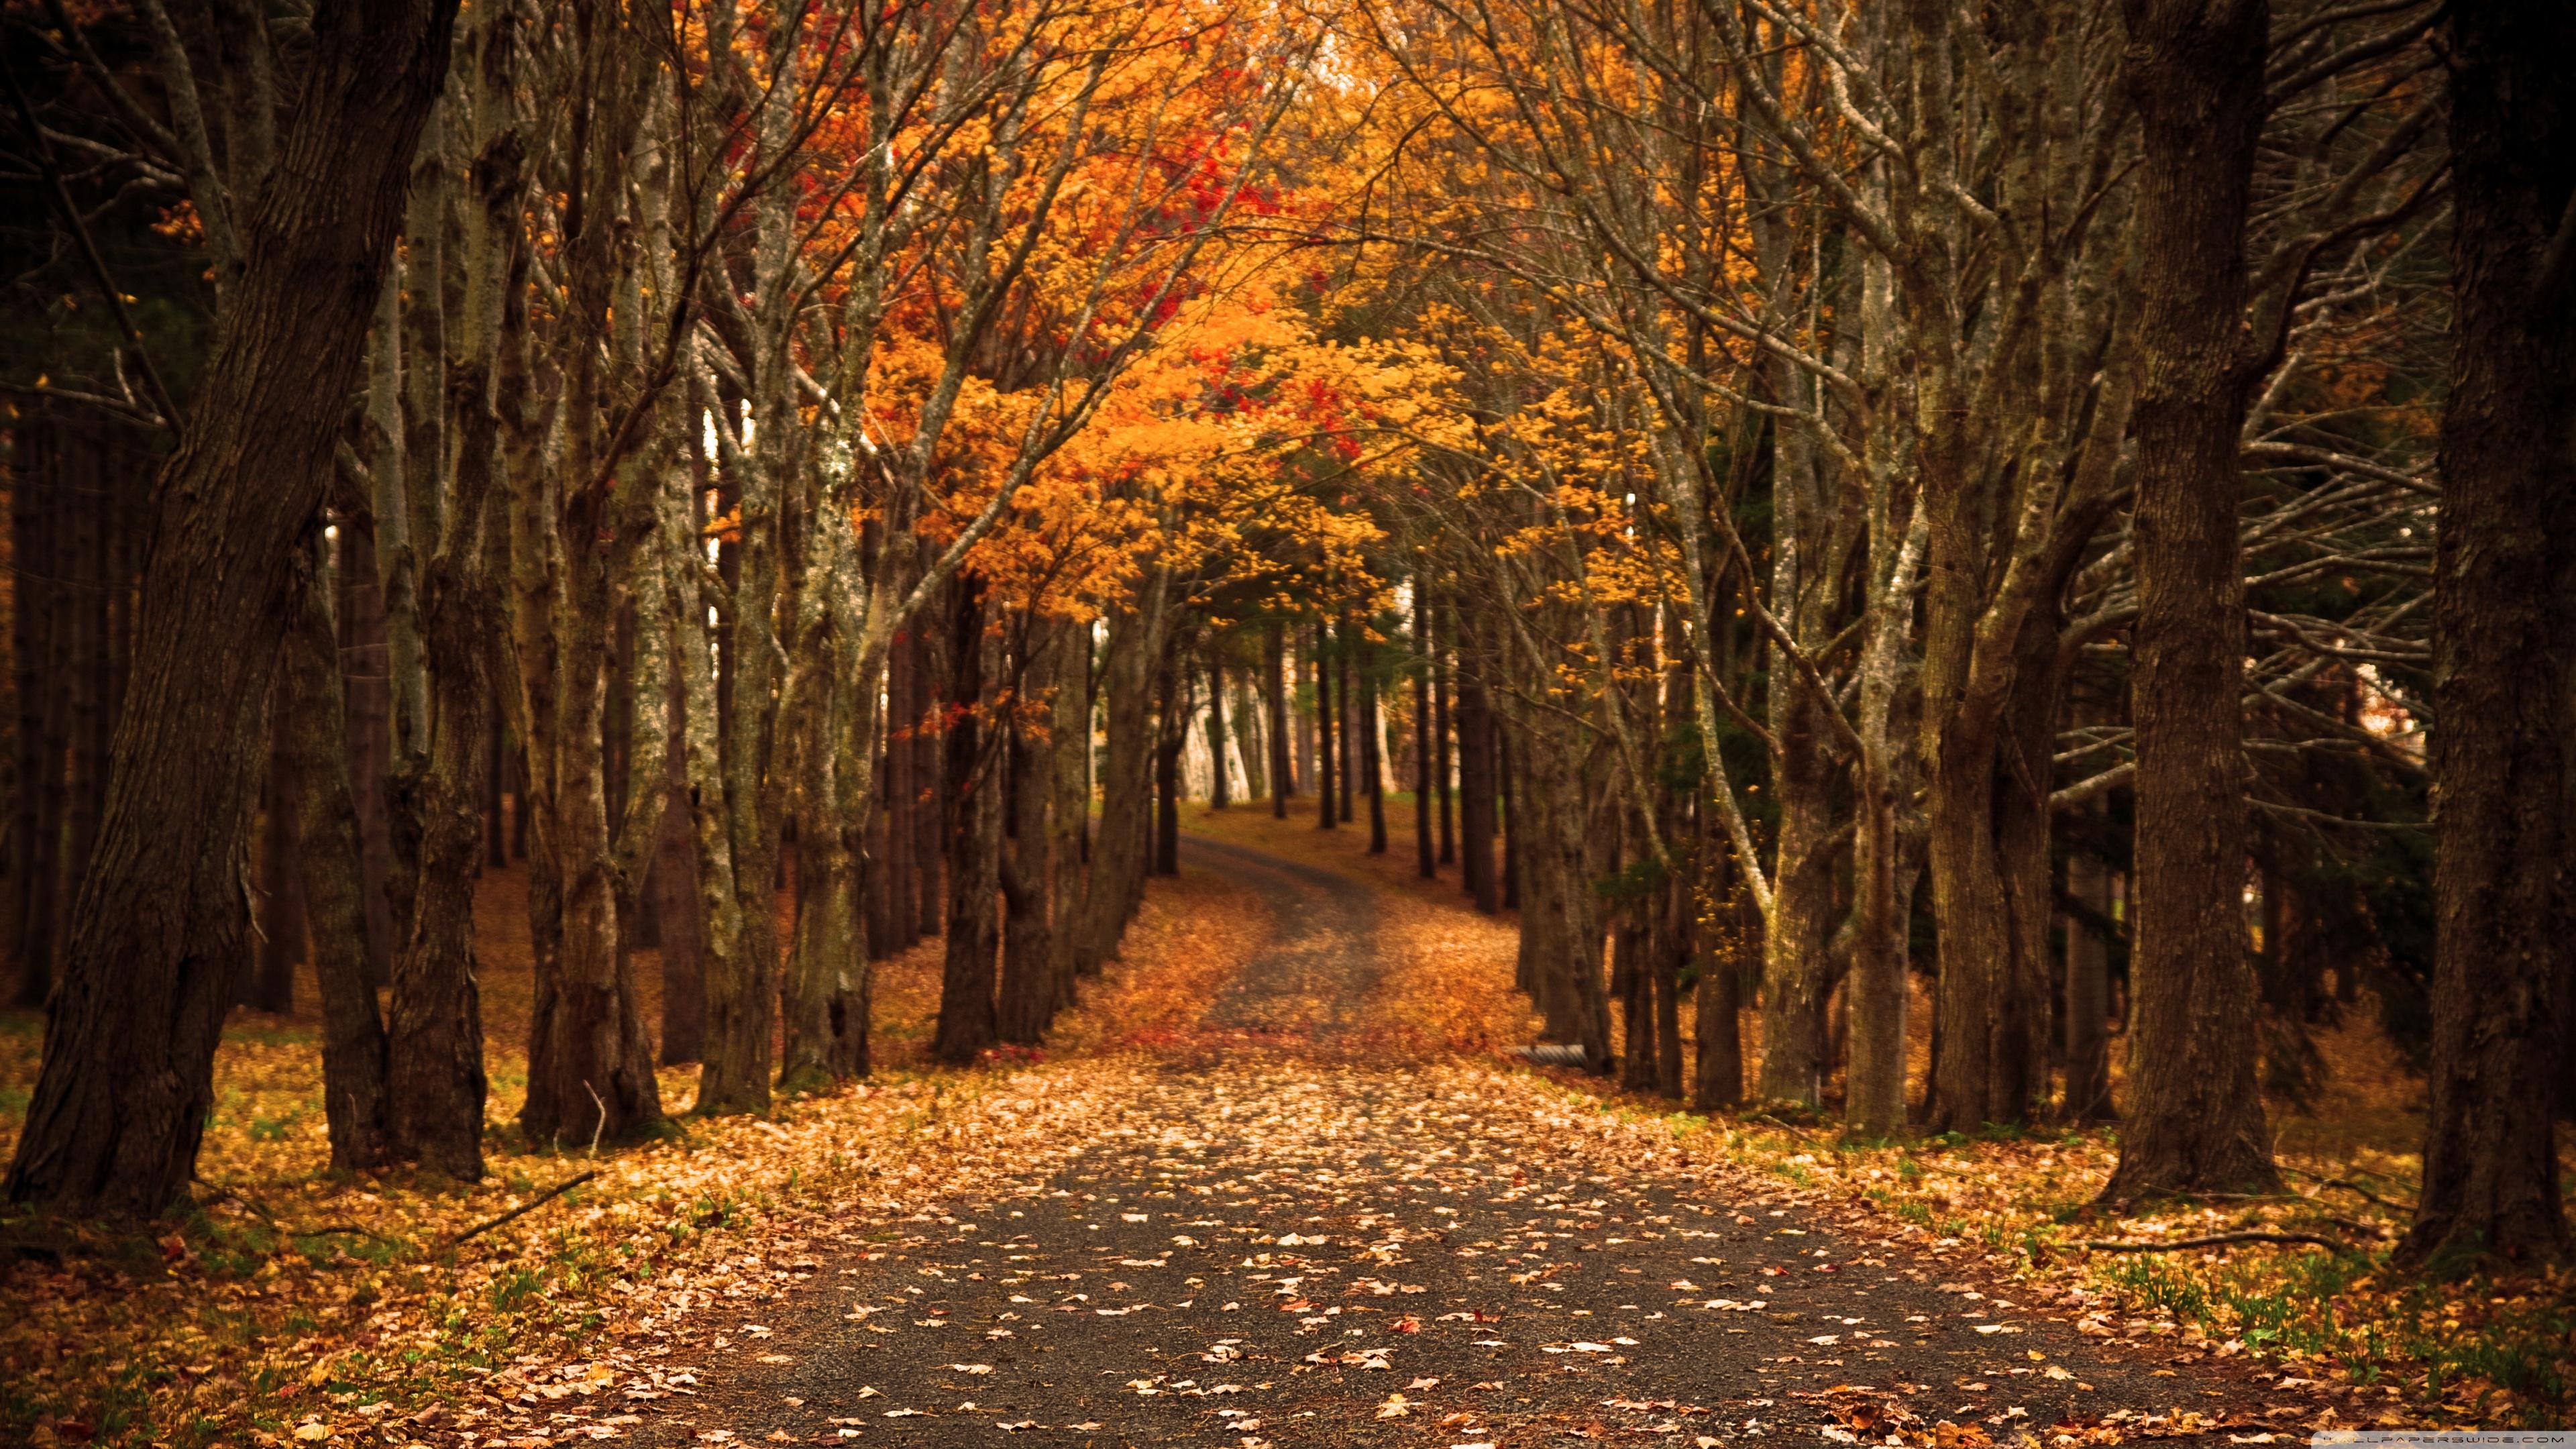 Late autumn photo